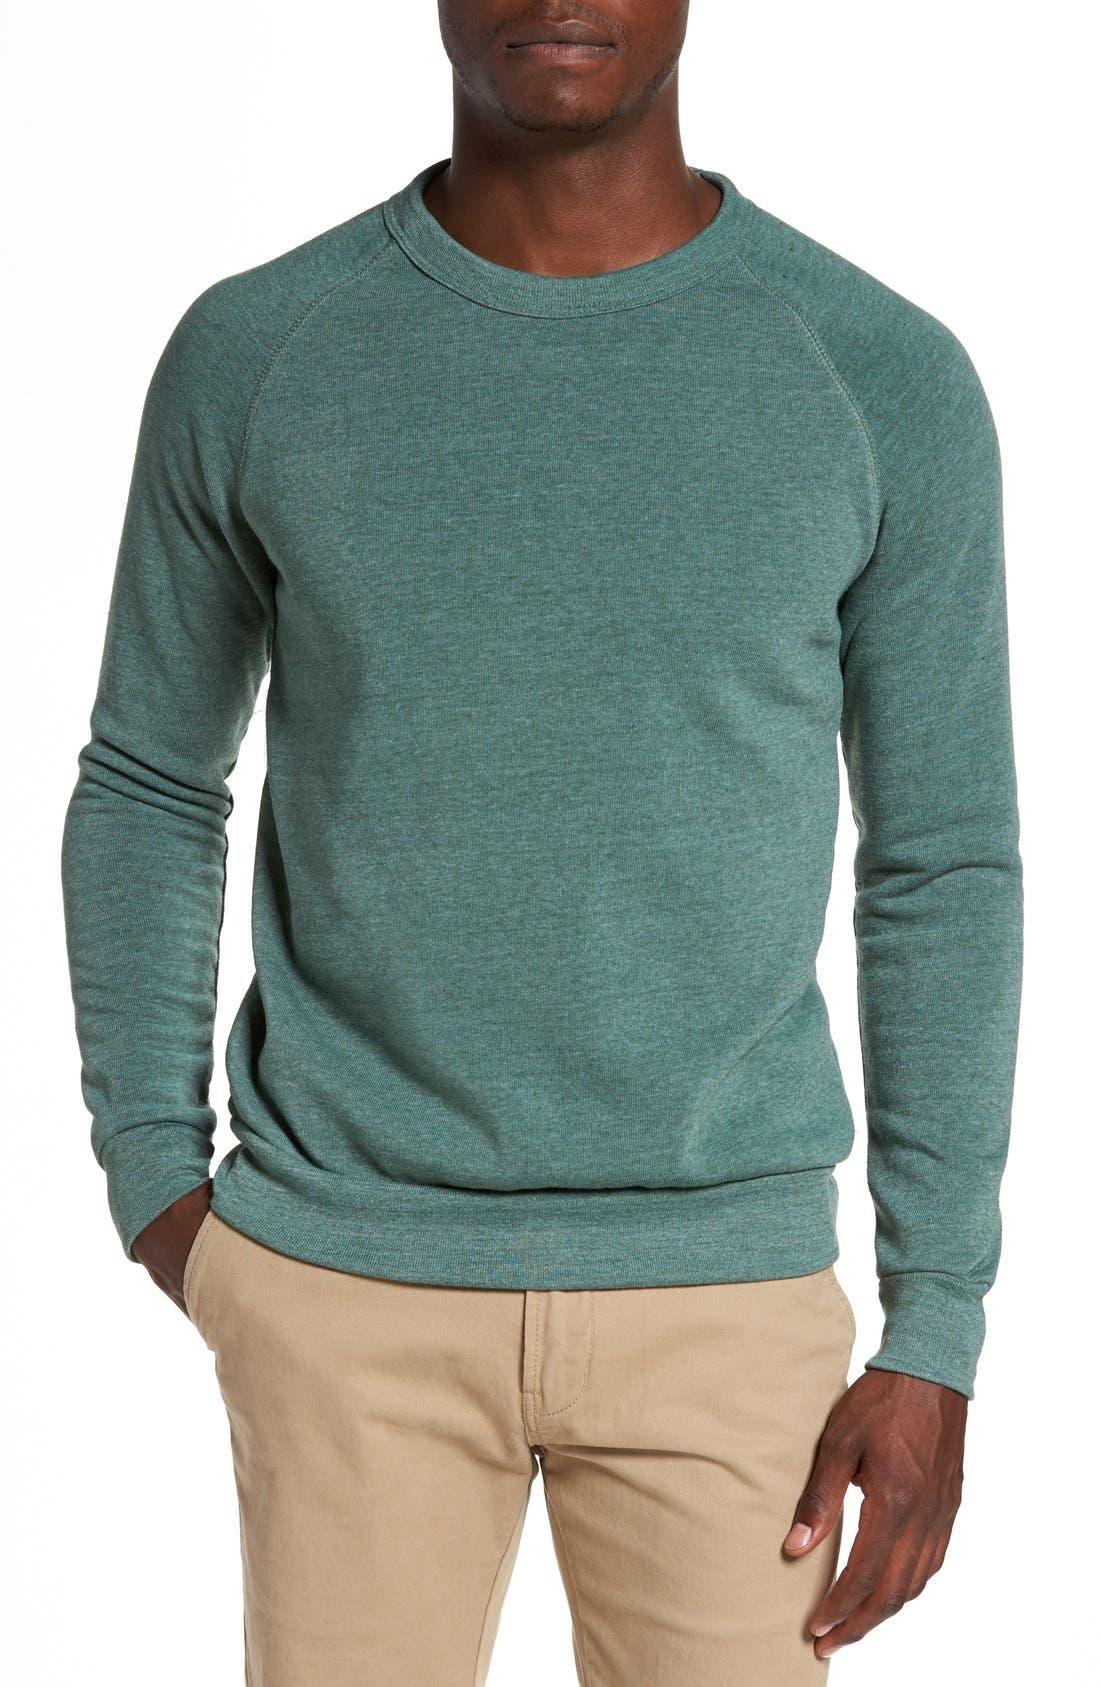 Alternative 'The Champ' Sweatshirt